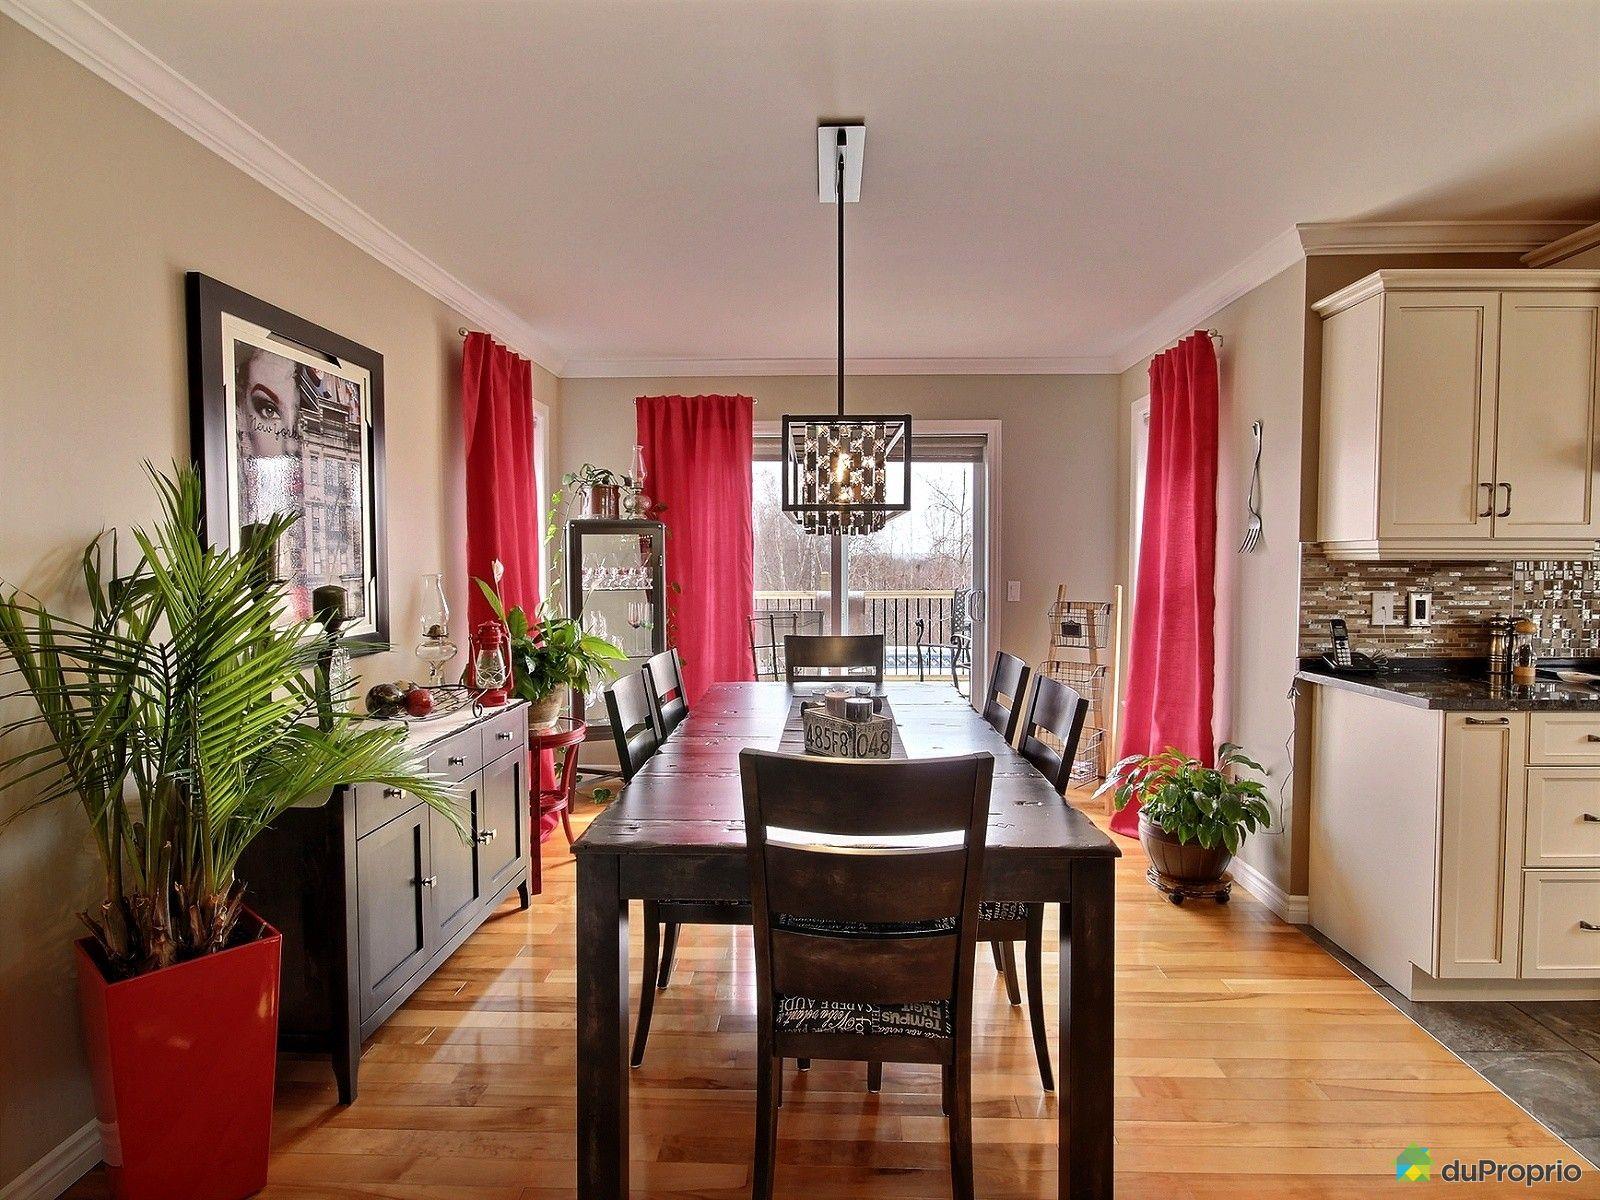 Maison vendre sherbrooke 1016 rue bastien immobilier for Salle a manger bastien